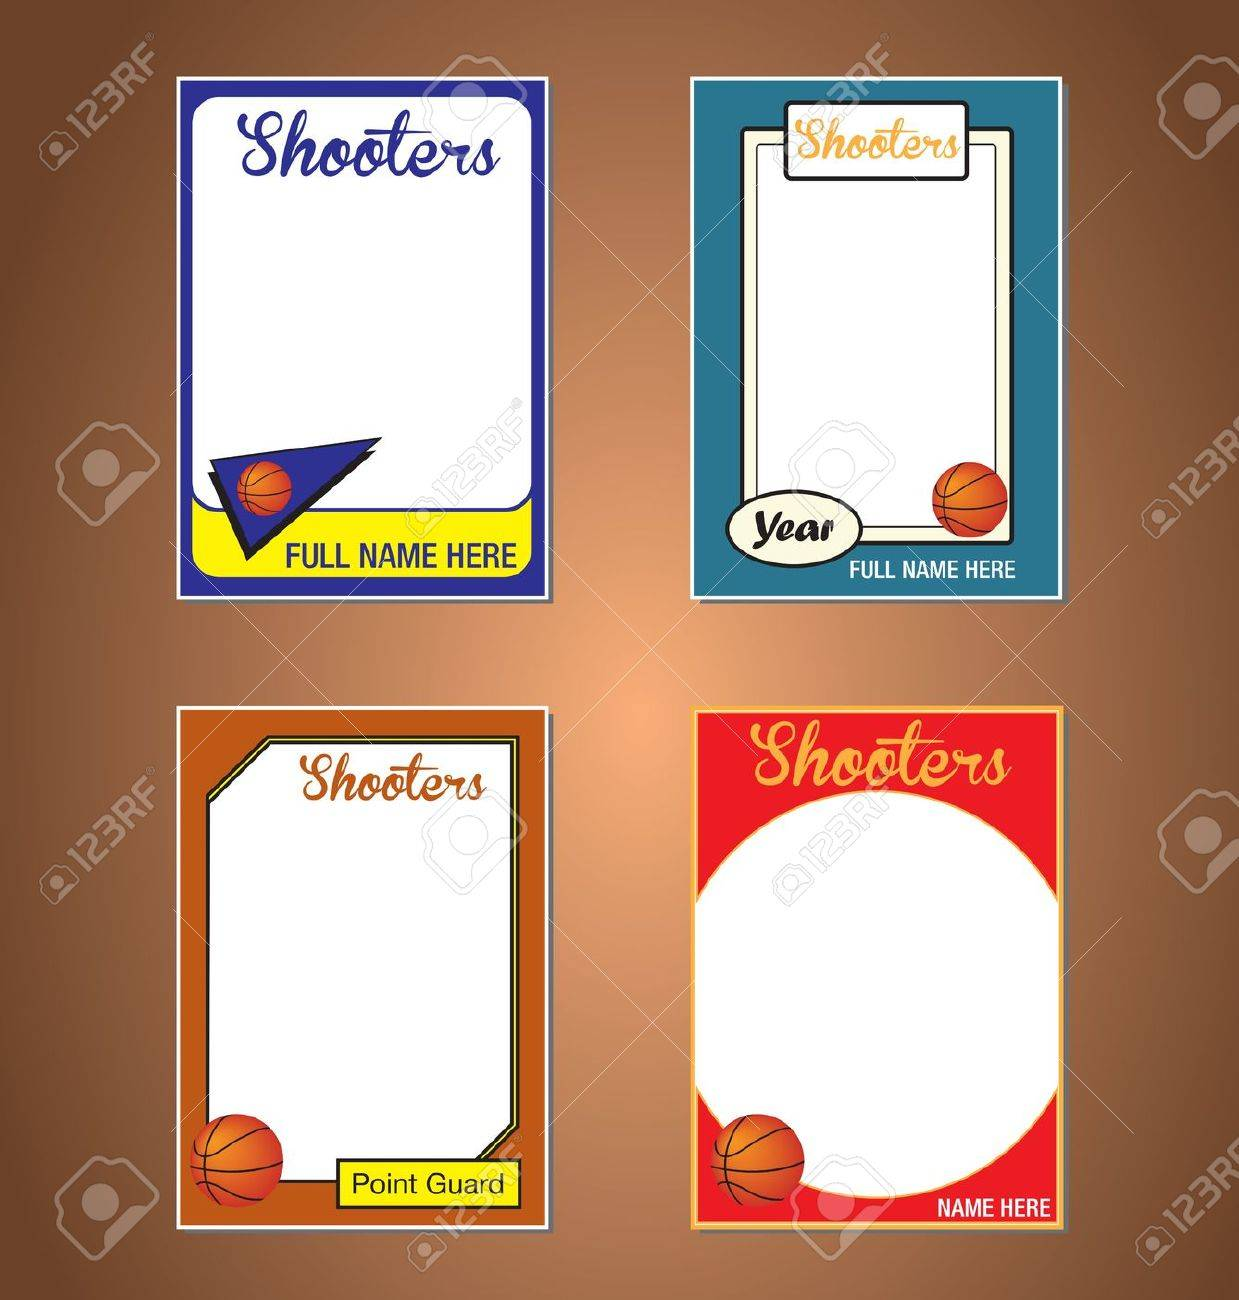 Basketball Trading Card Frames Royalty Free Cliparts, Vectors, And ...